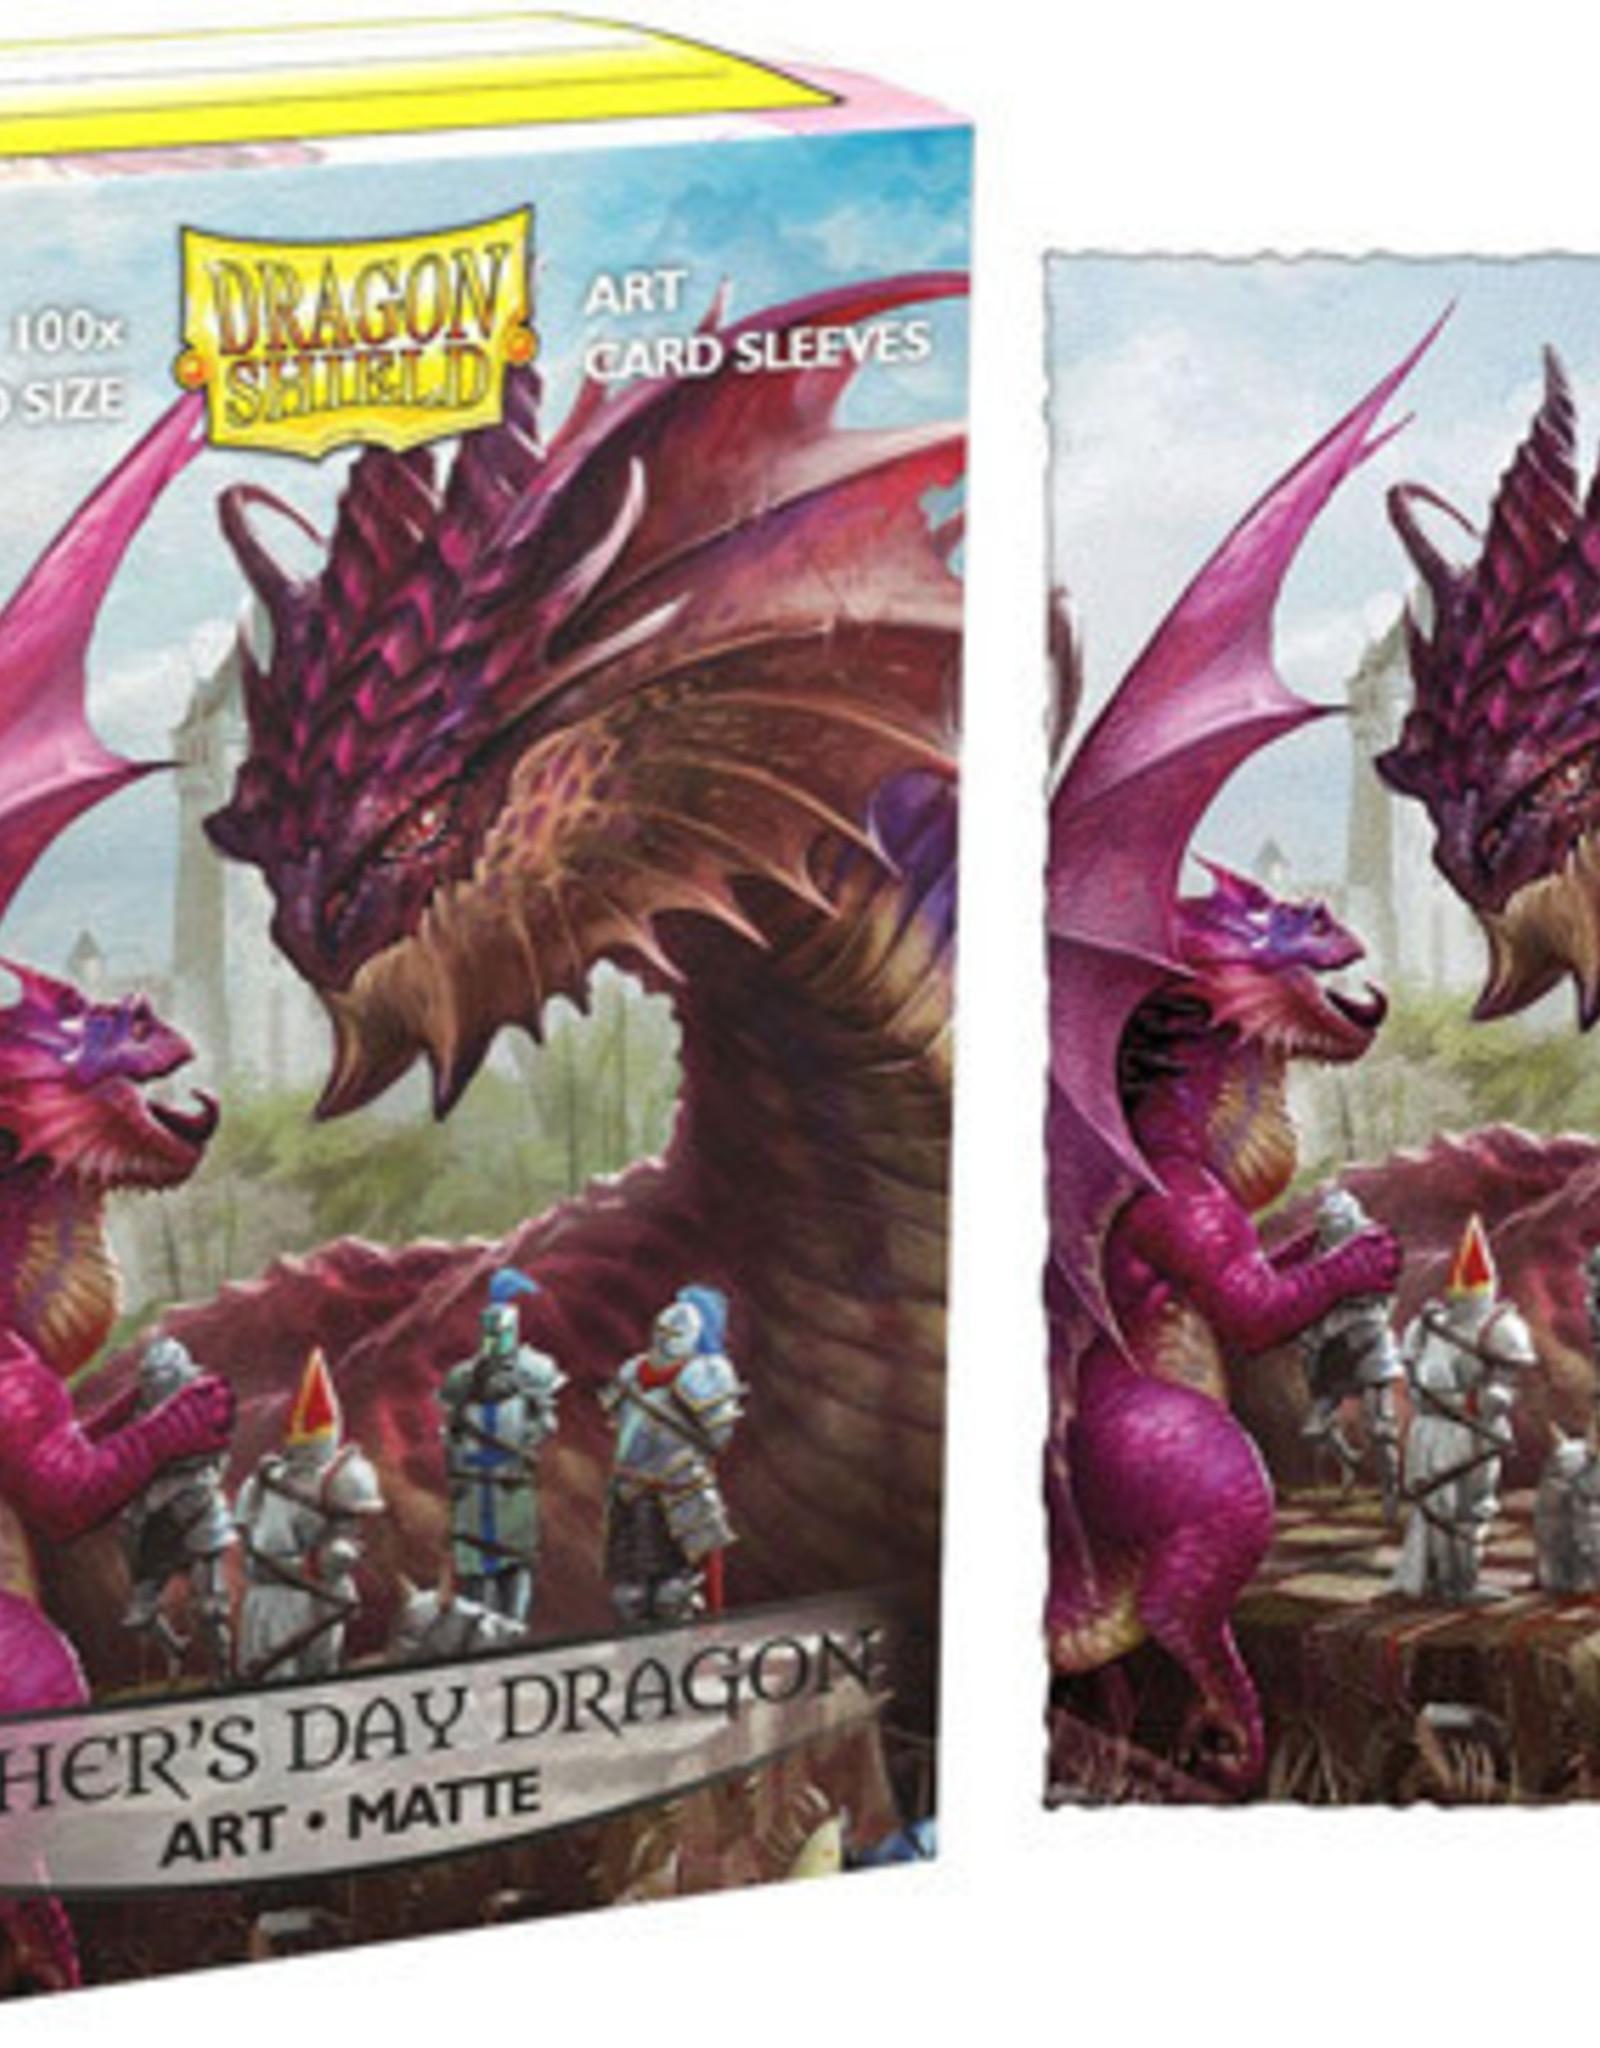 Dragonshield Dragonshield 100 Box Sleeves Art Matte Fathers Day 2020